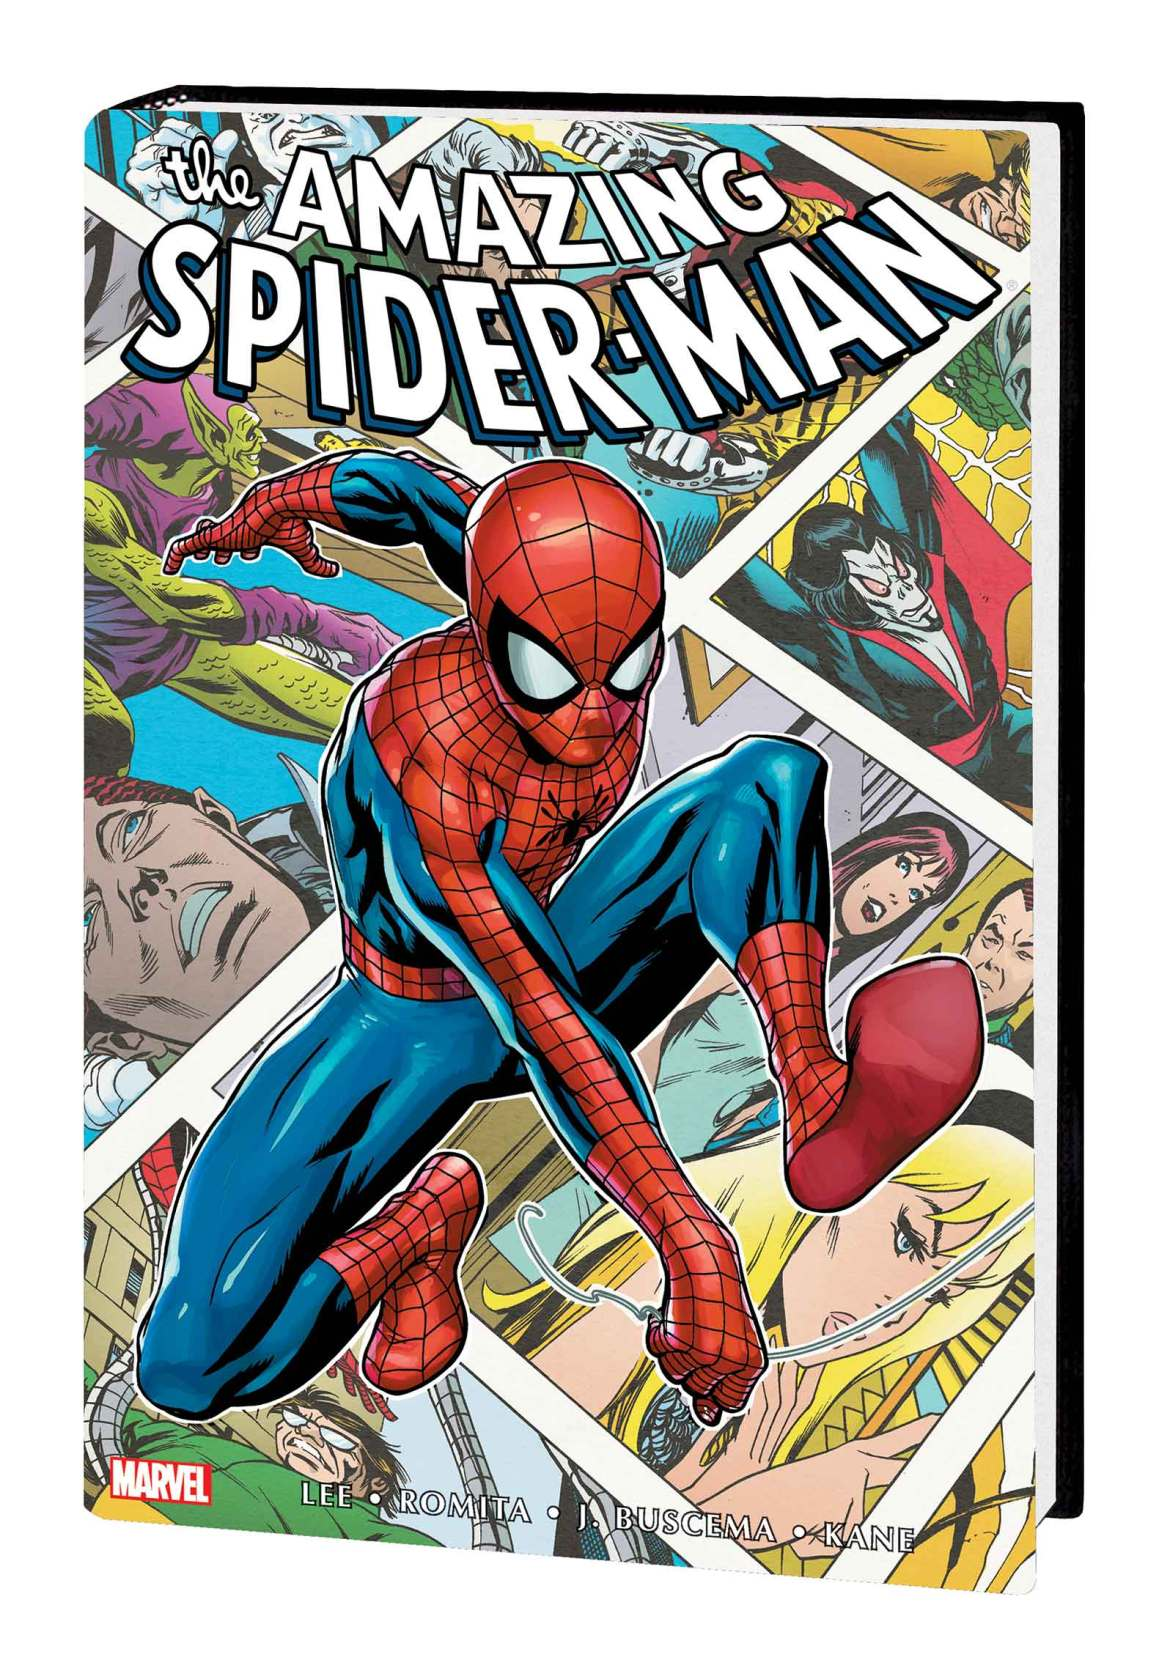 ASMOMNIV3HC_cover-1 Marvel Comics May 2021 Solicitations